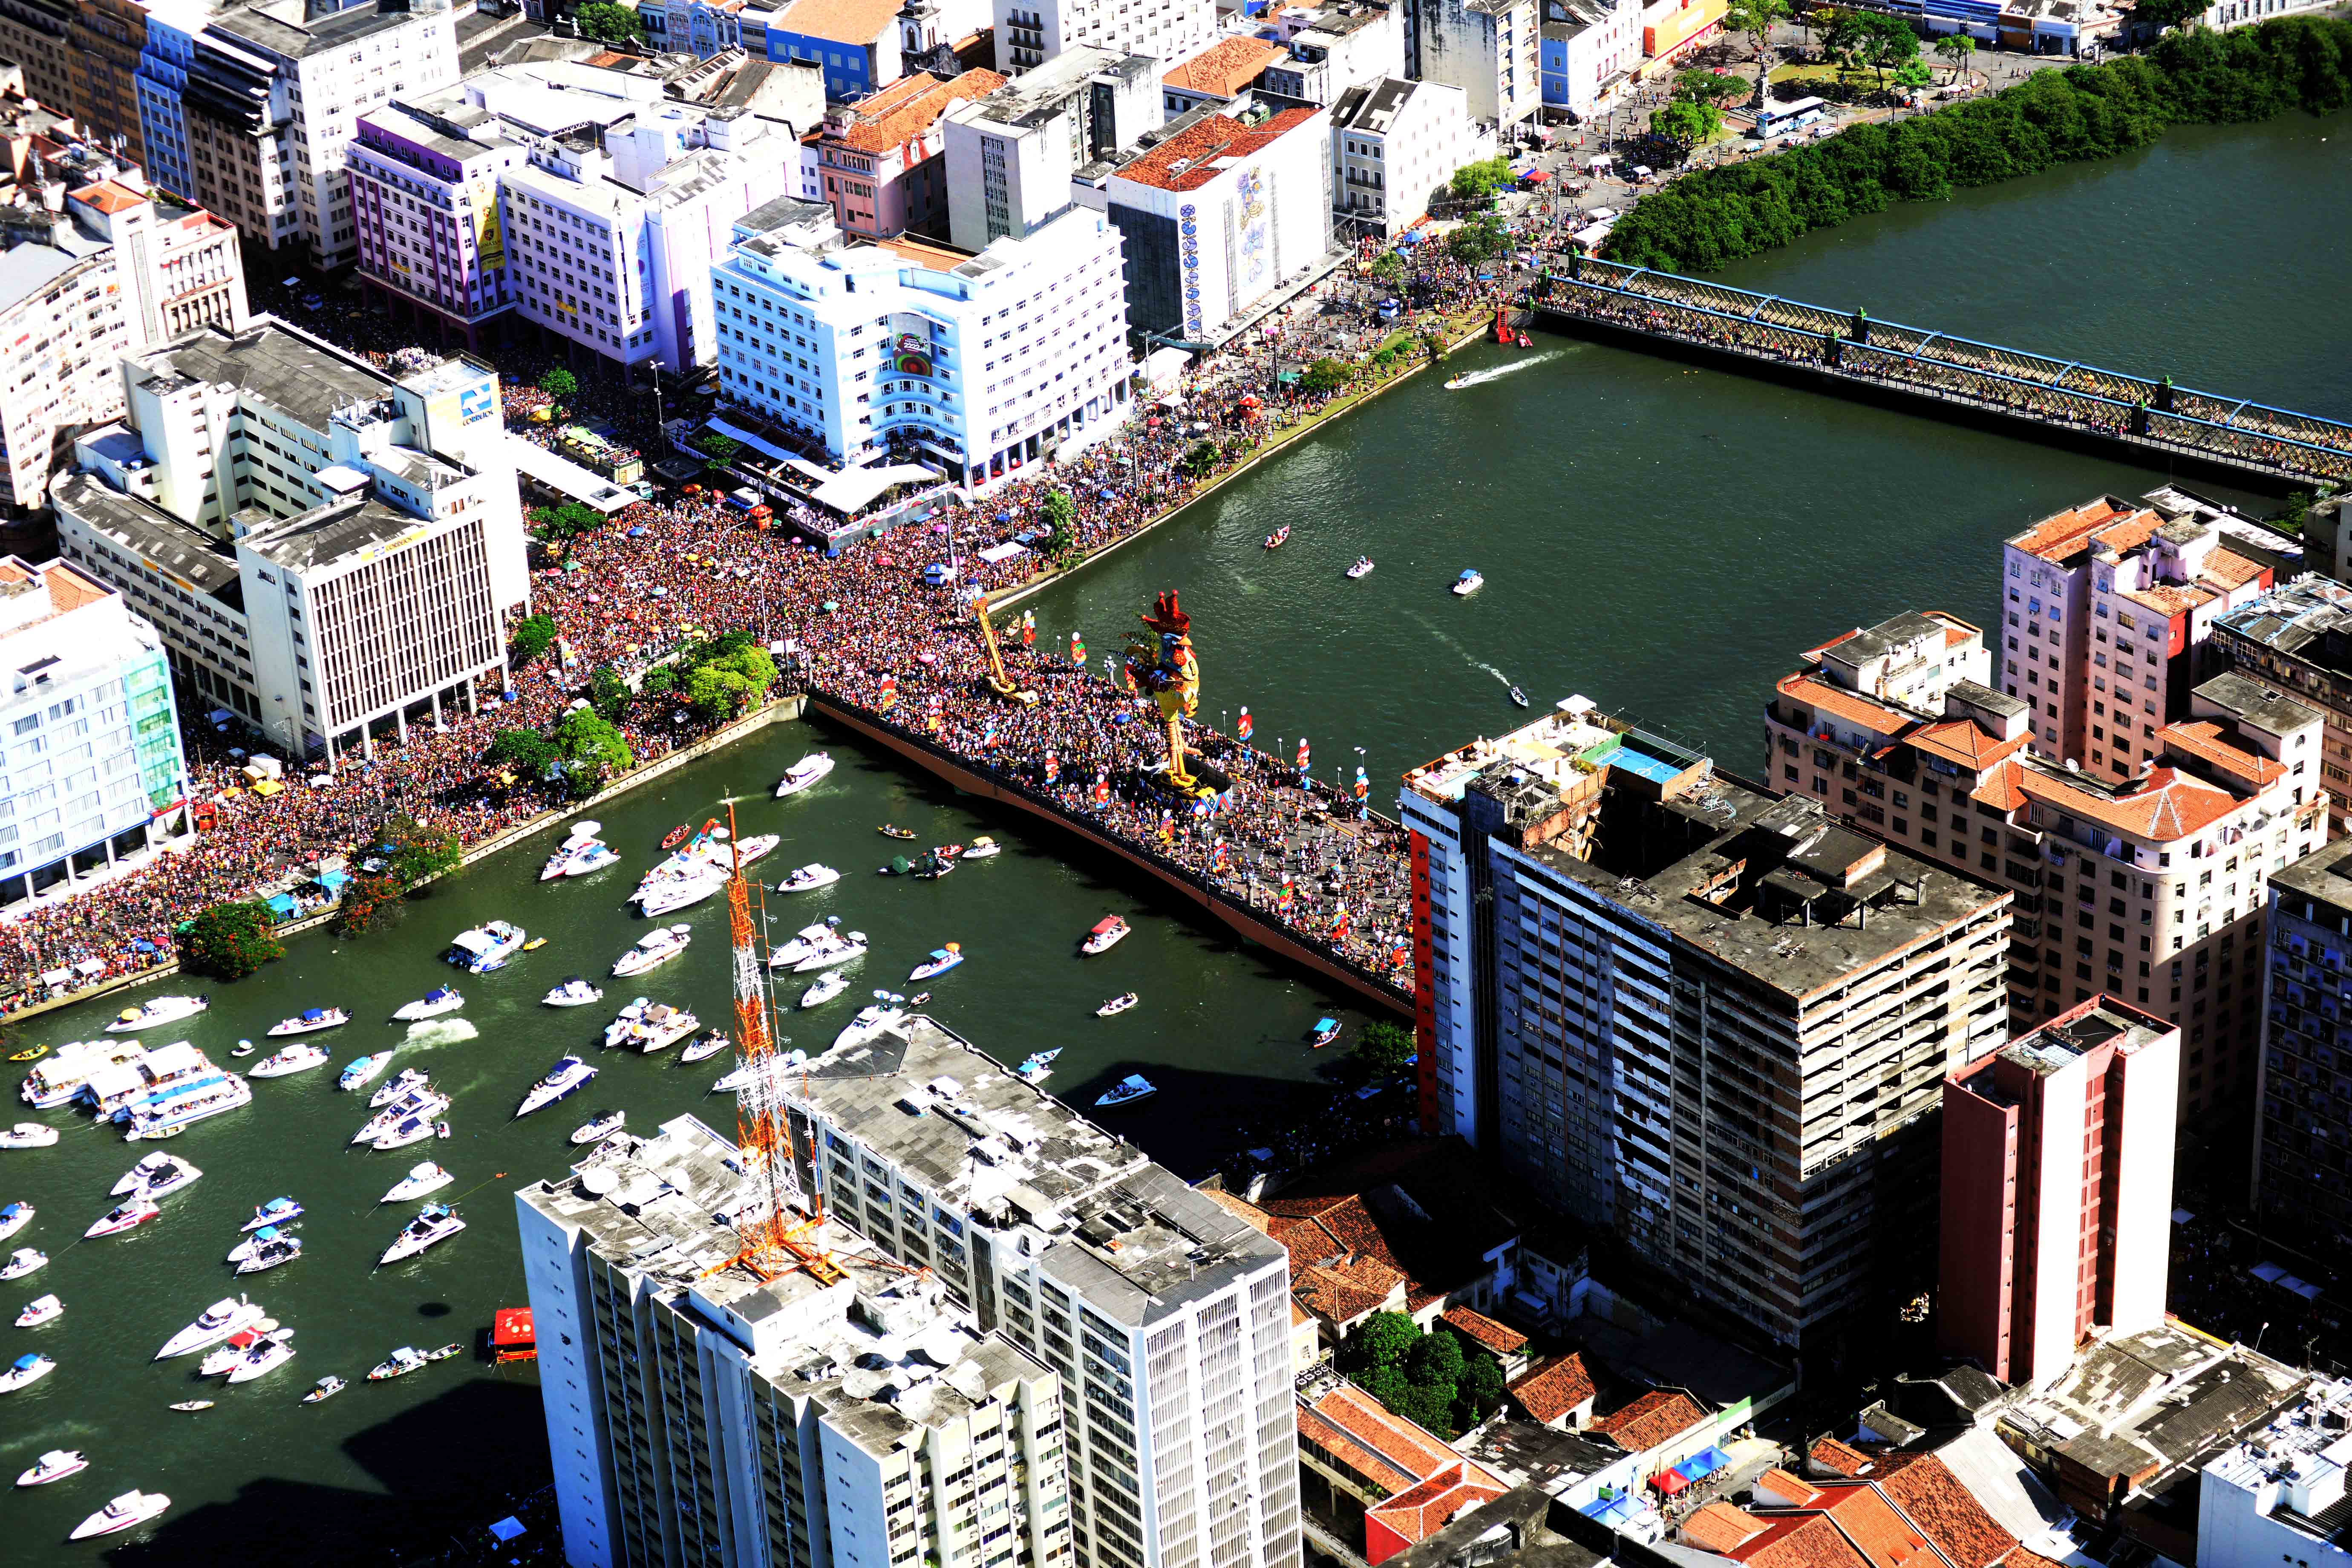 Descubre Carnaval de Janeiro Expresiones Culturales - Carnaval en Brasil